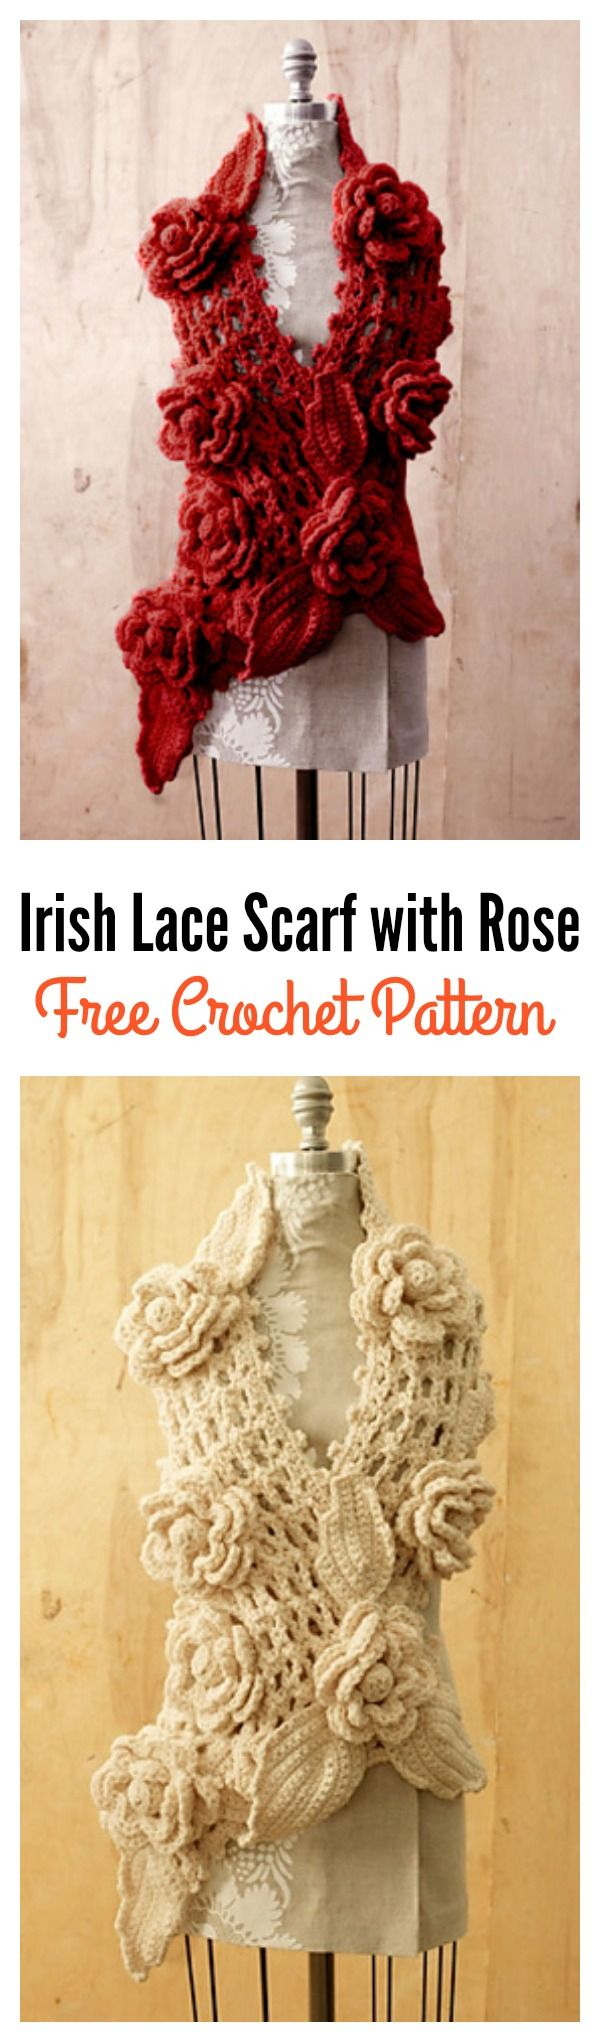 Crochet Irish Lace Scarf with Rose Free Pattern